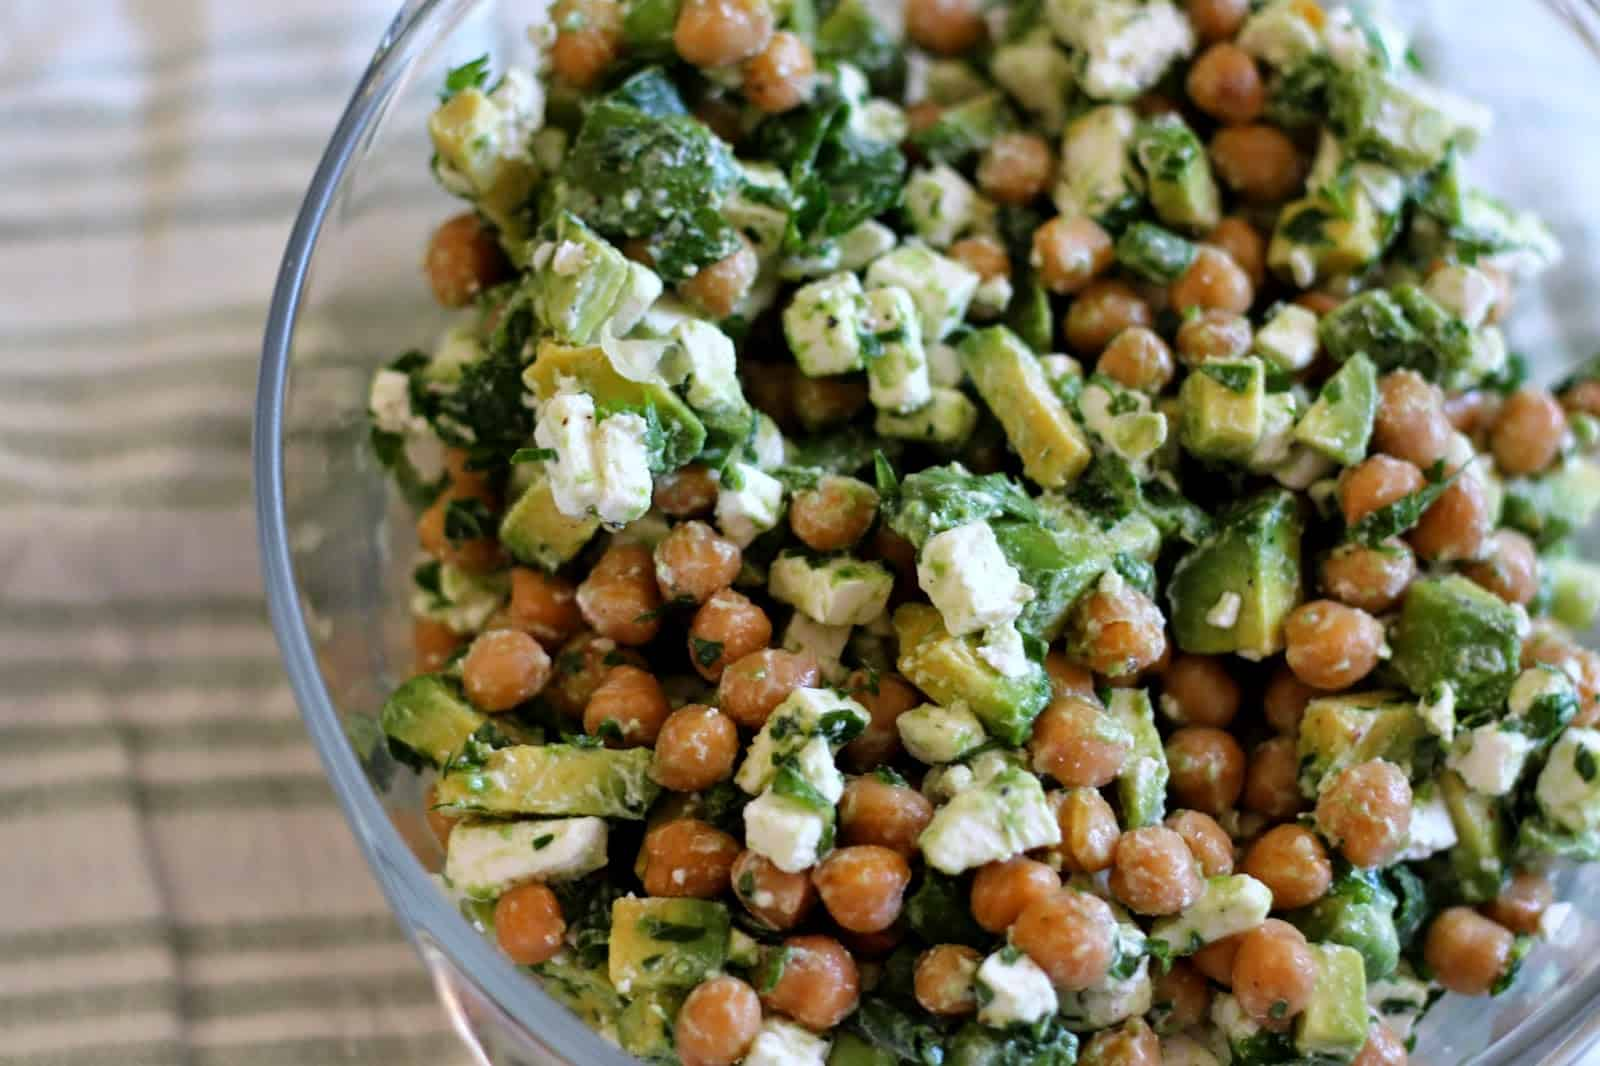 Feta and avocado chickpea salad